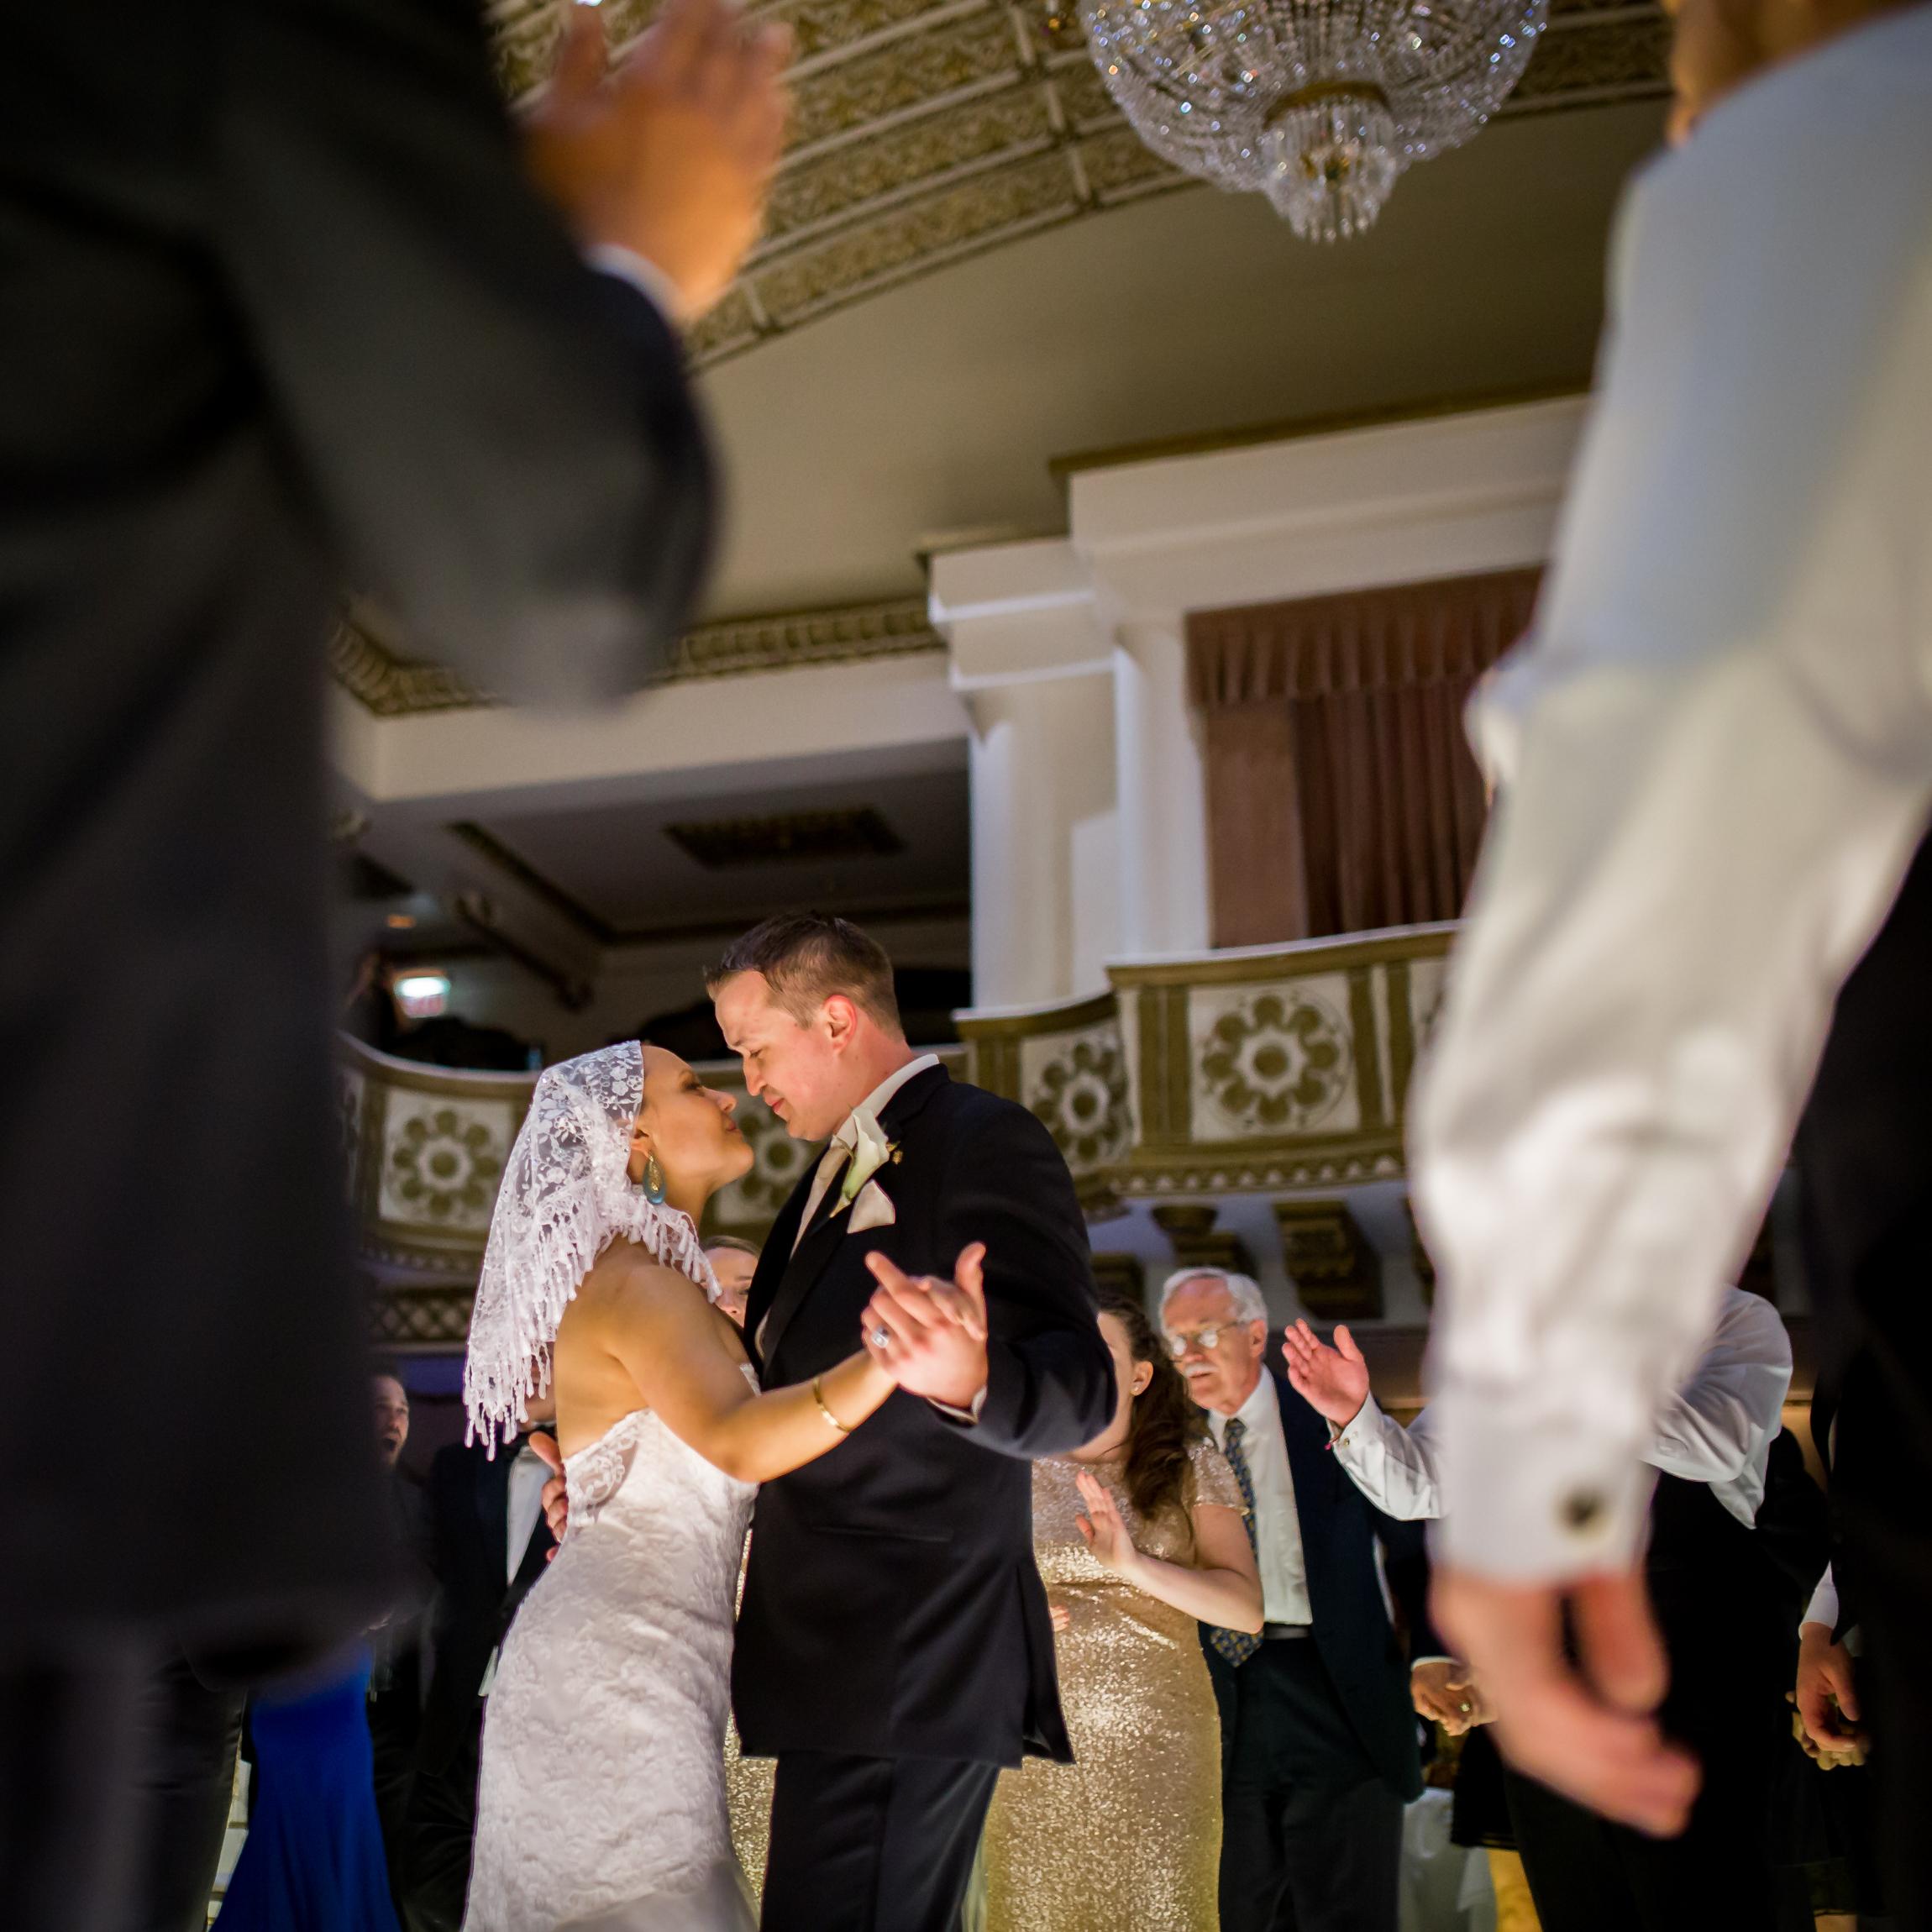 Ukrainian-dancing-wedding-photographyUkrainian-dancing-wedding-photography